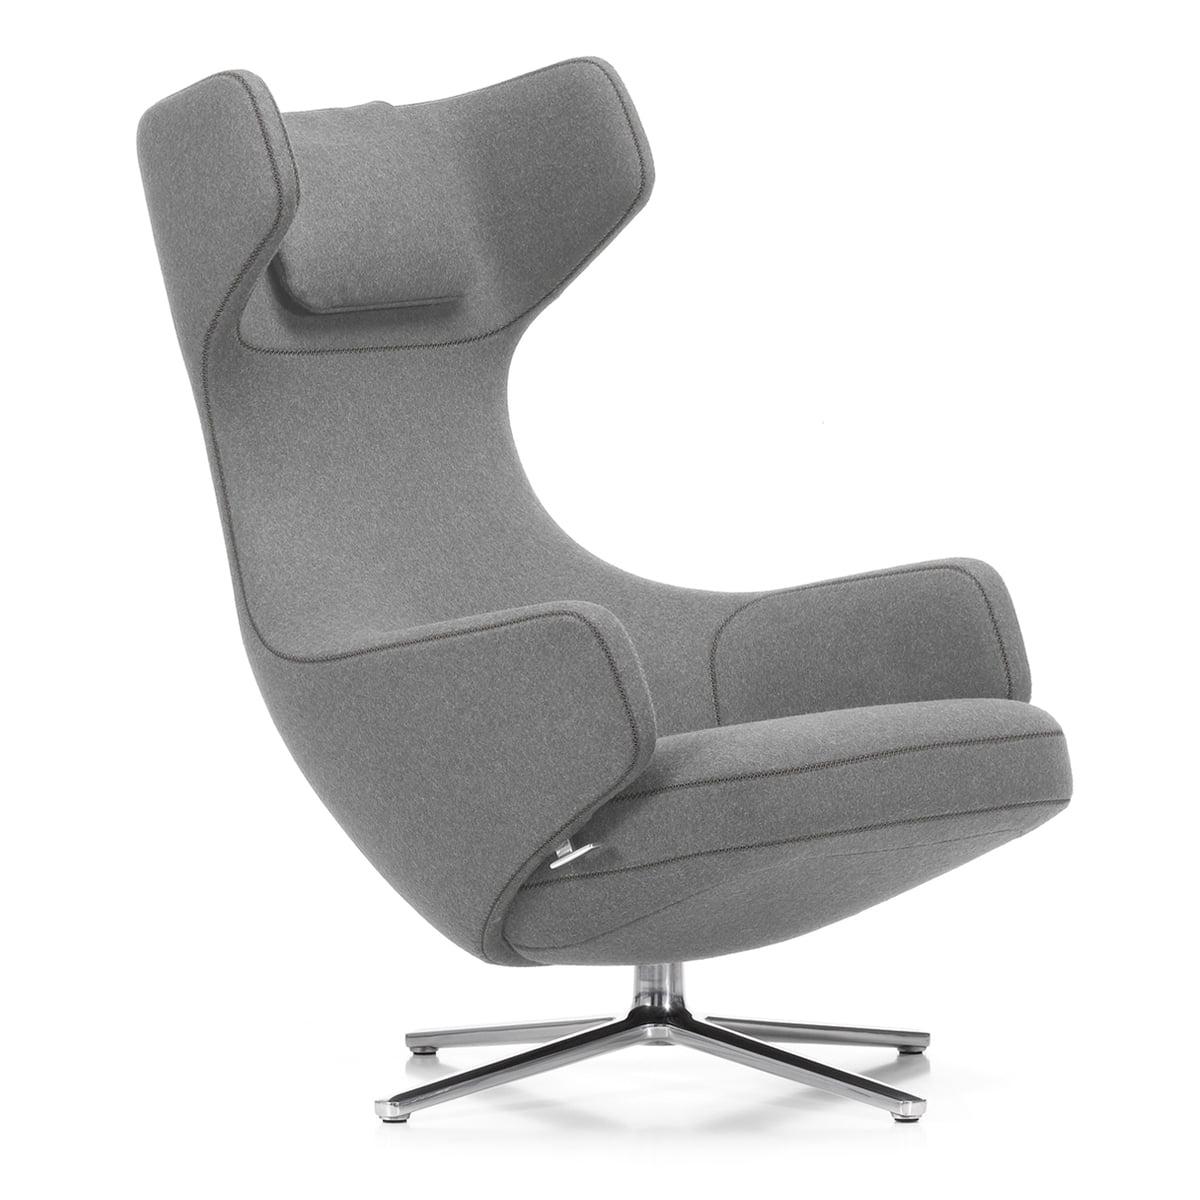 vitra grand repos sessel hellgrau 01 kiesel. Black Bedroom Furniture Sets. Home Design Ideas